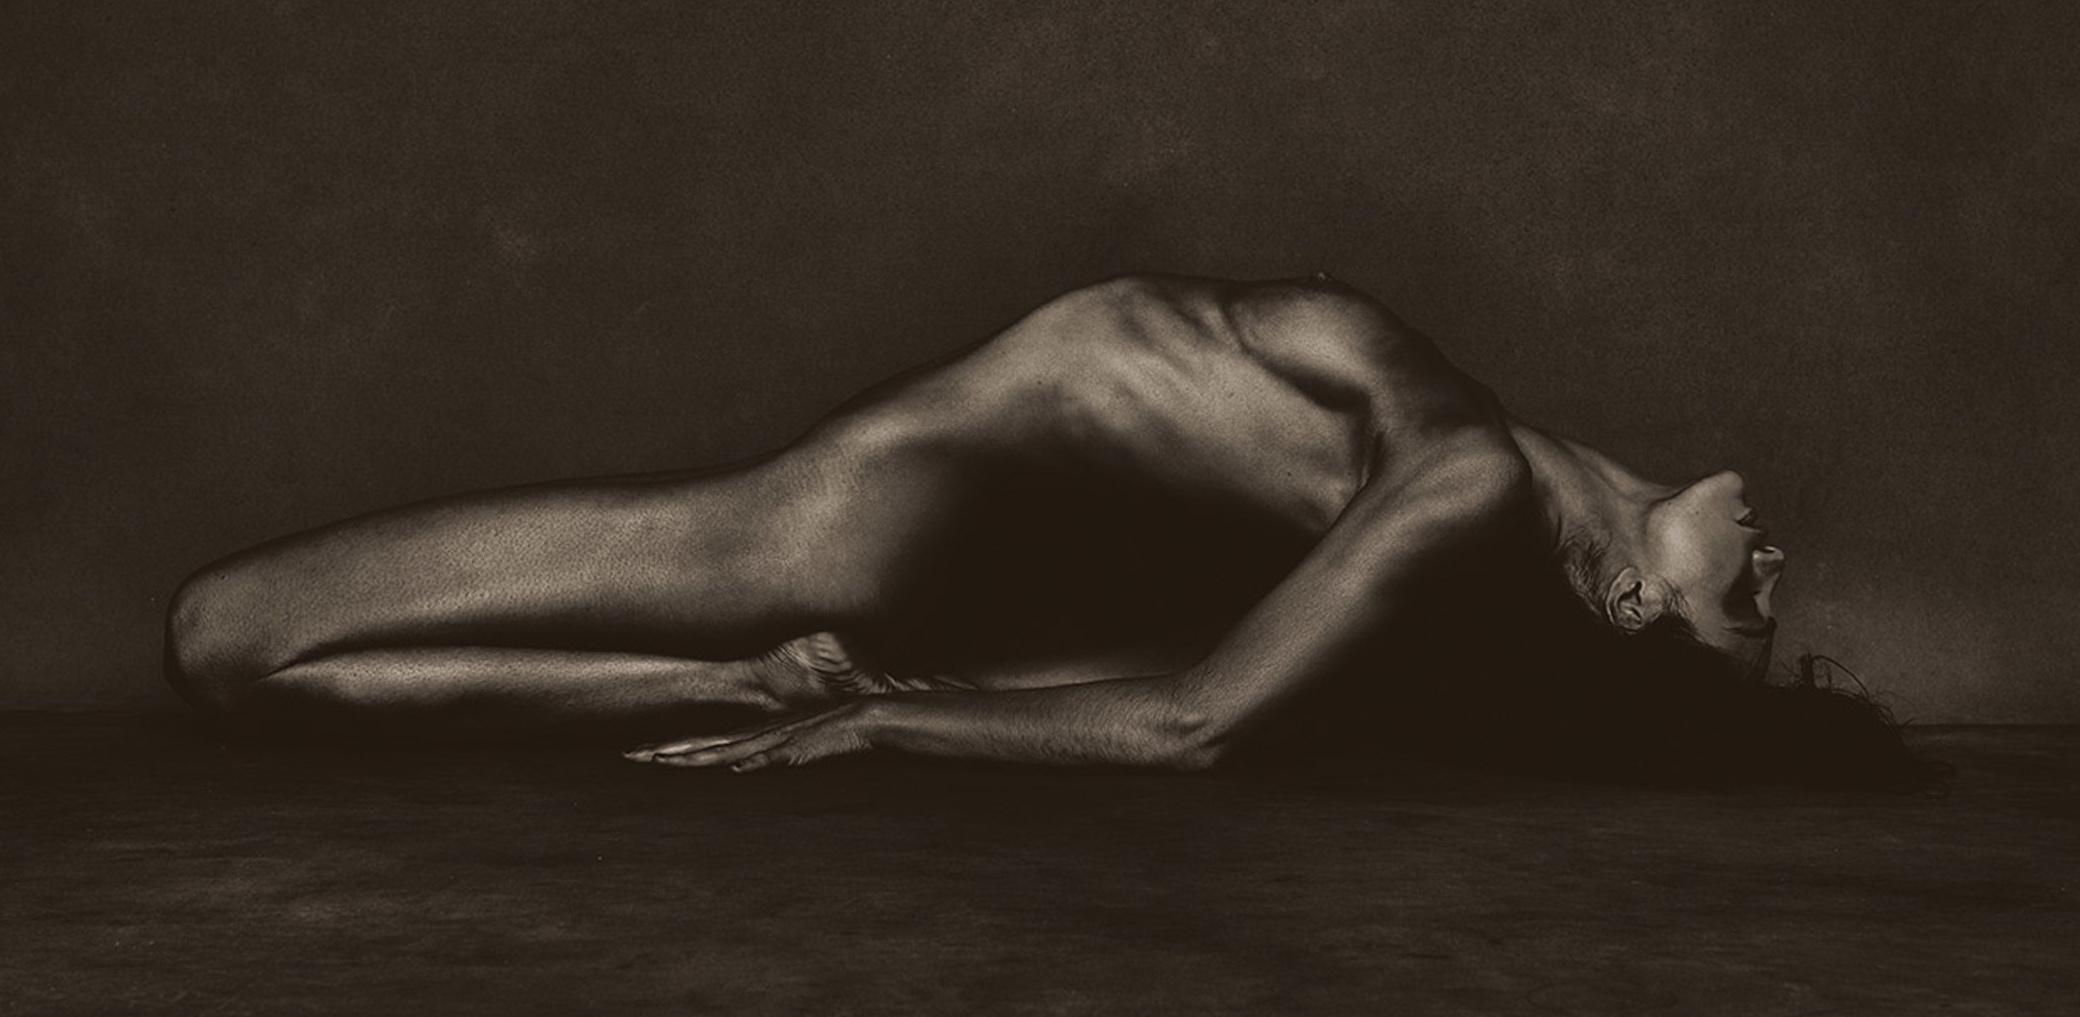 celebrity nudeflash   picture   2015 10 original kourtney